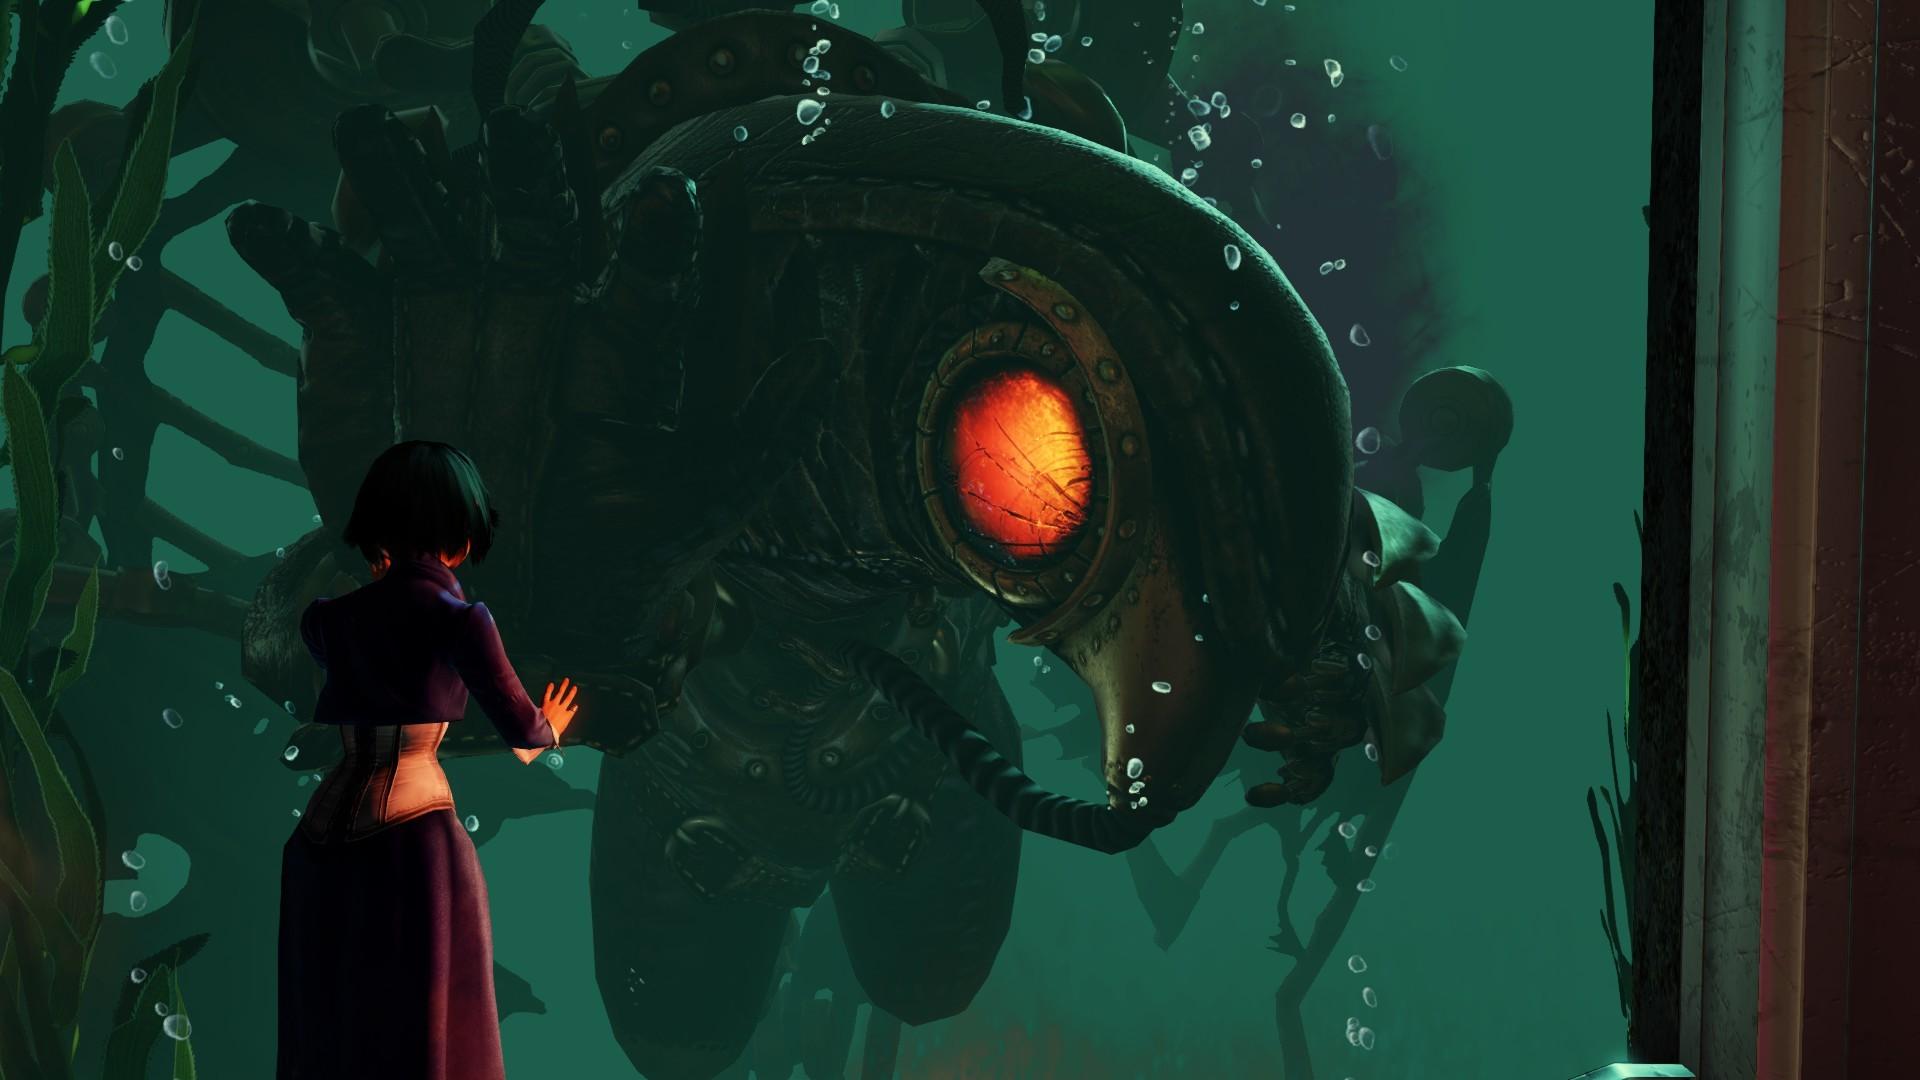 BioShock Infinite Songbird, bioshock infinite songbird wallpaper .